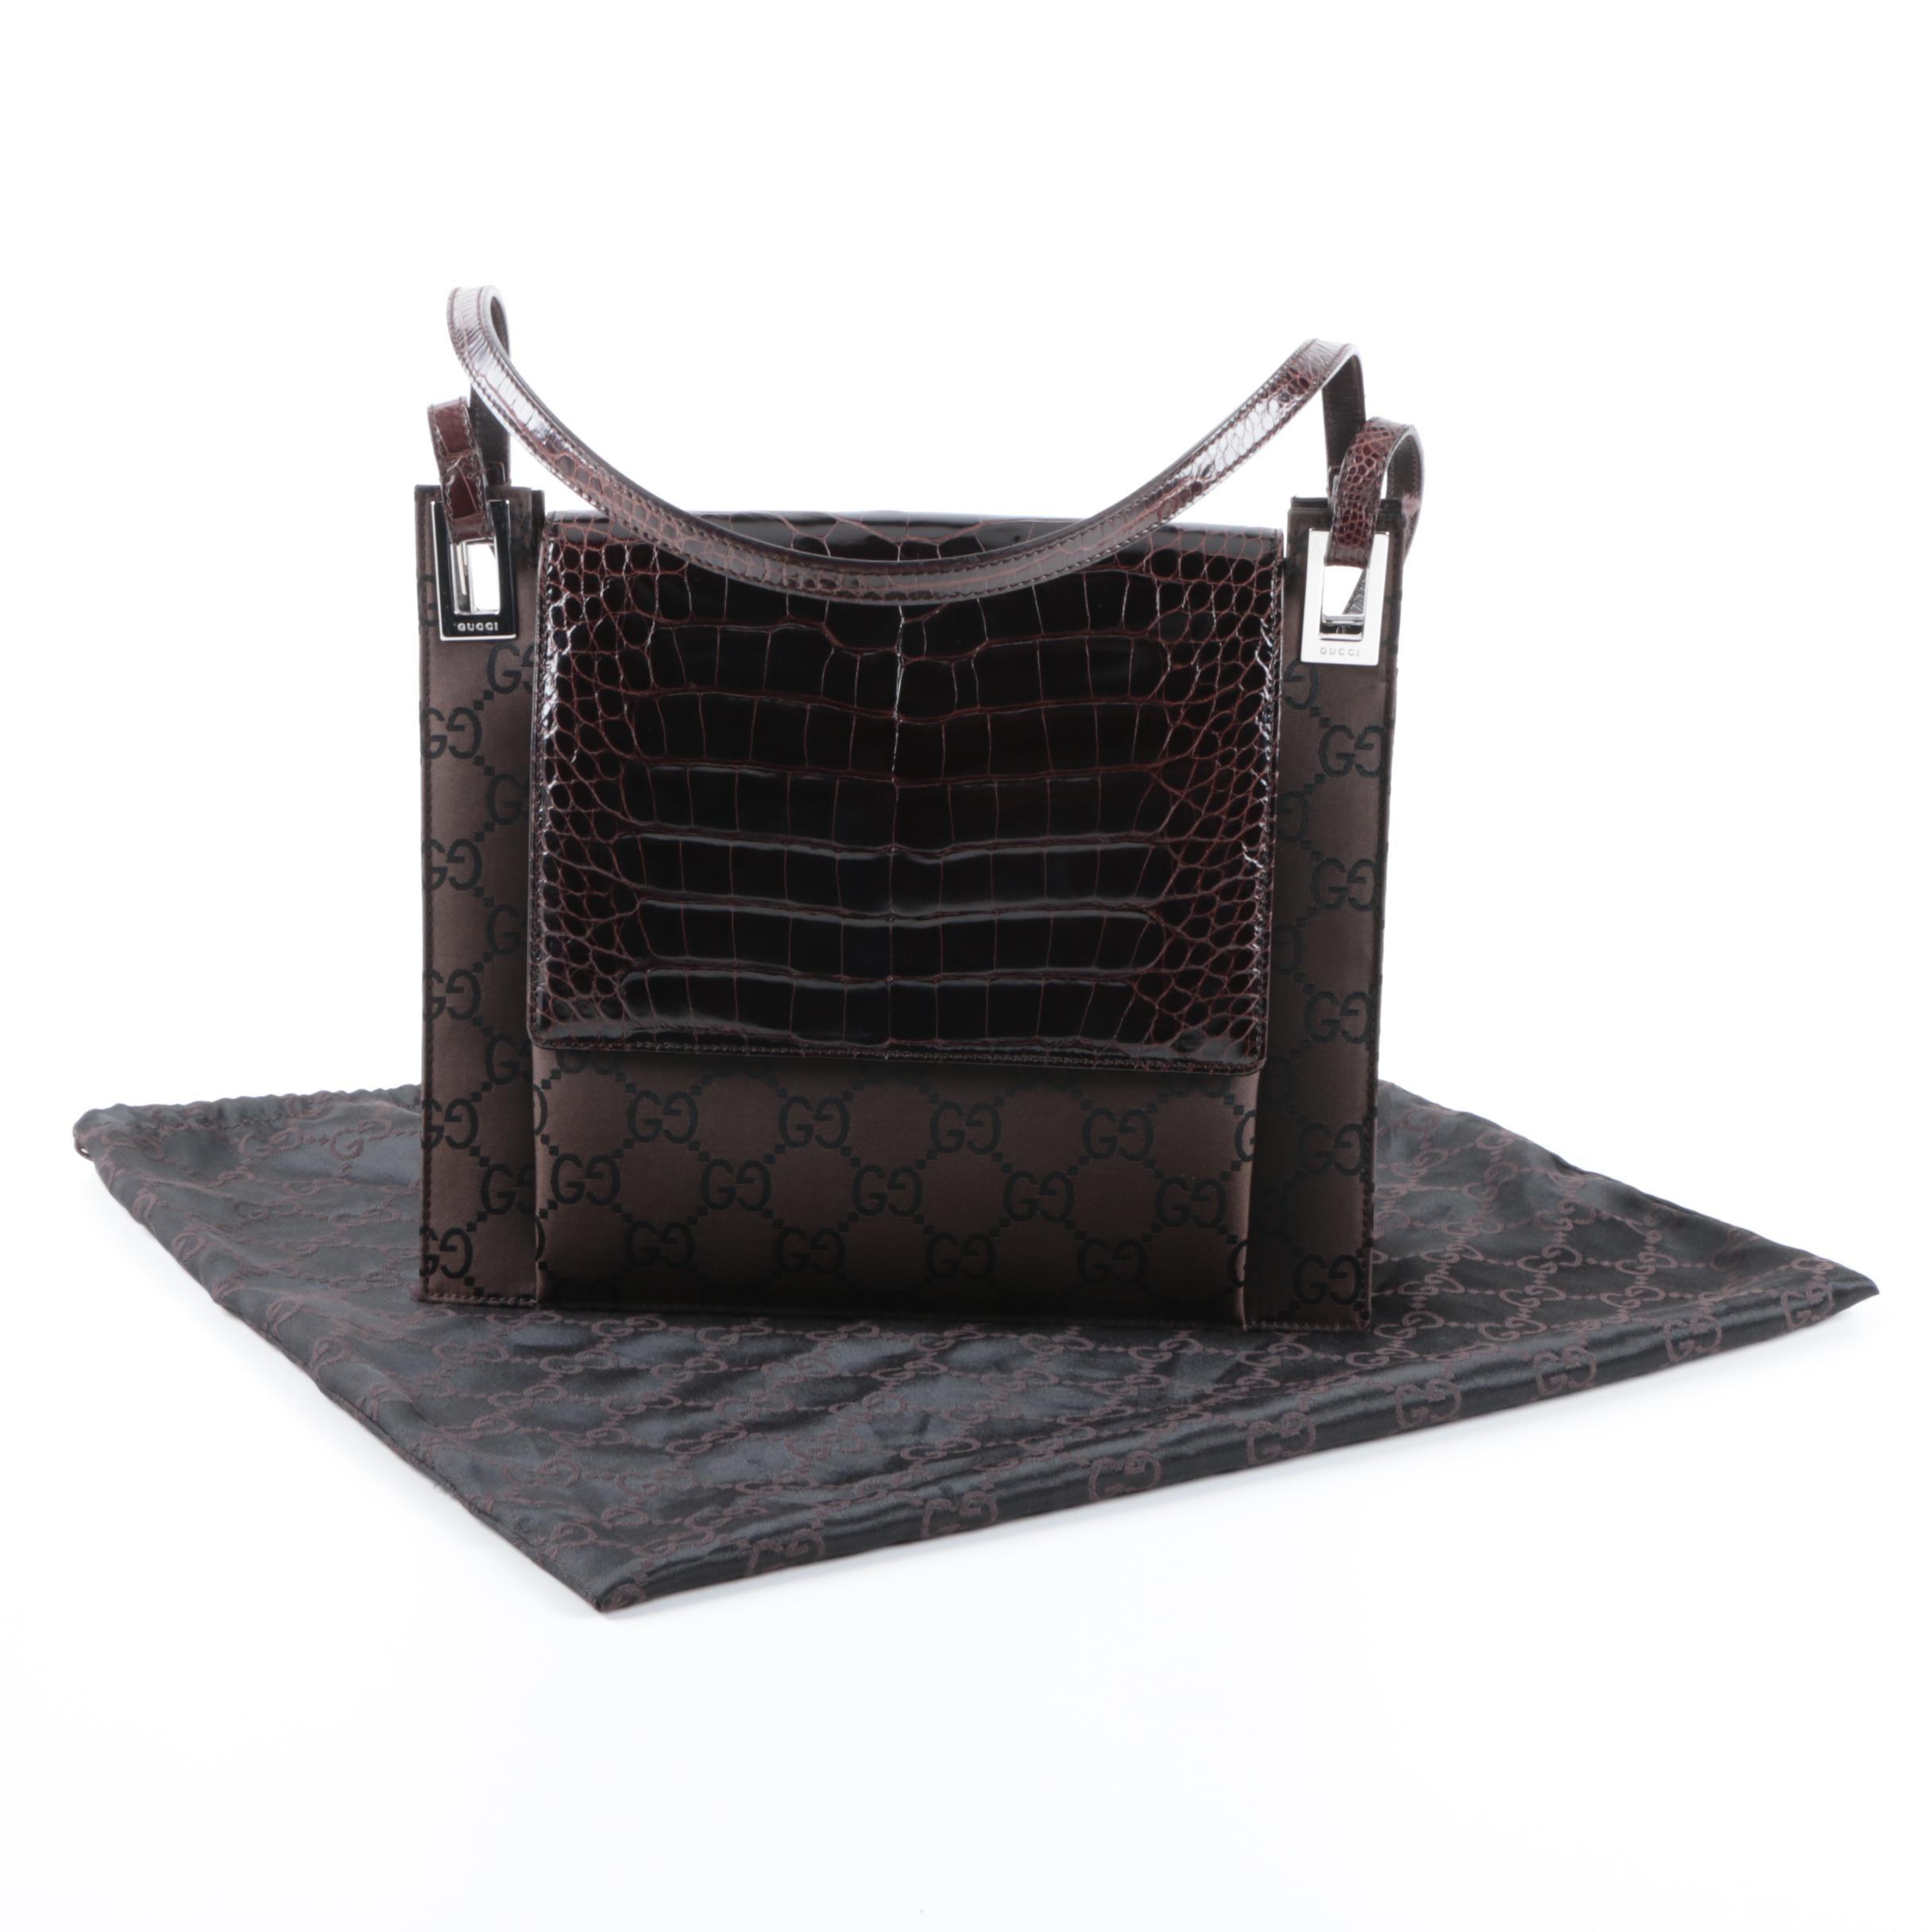 Gucci Monogram Nylon and Alligator Handbag